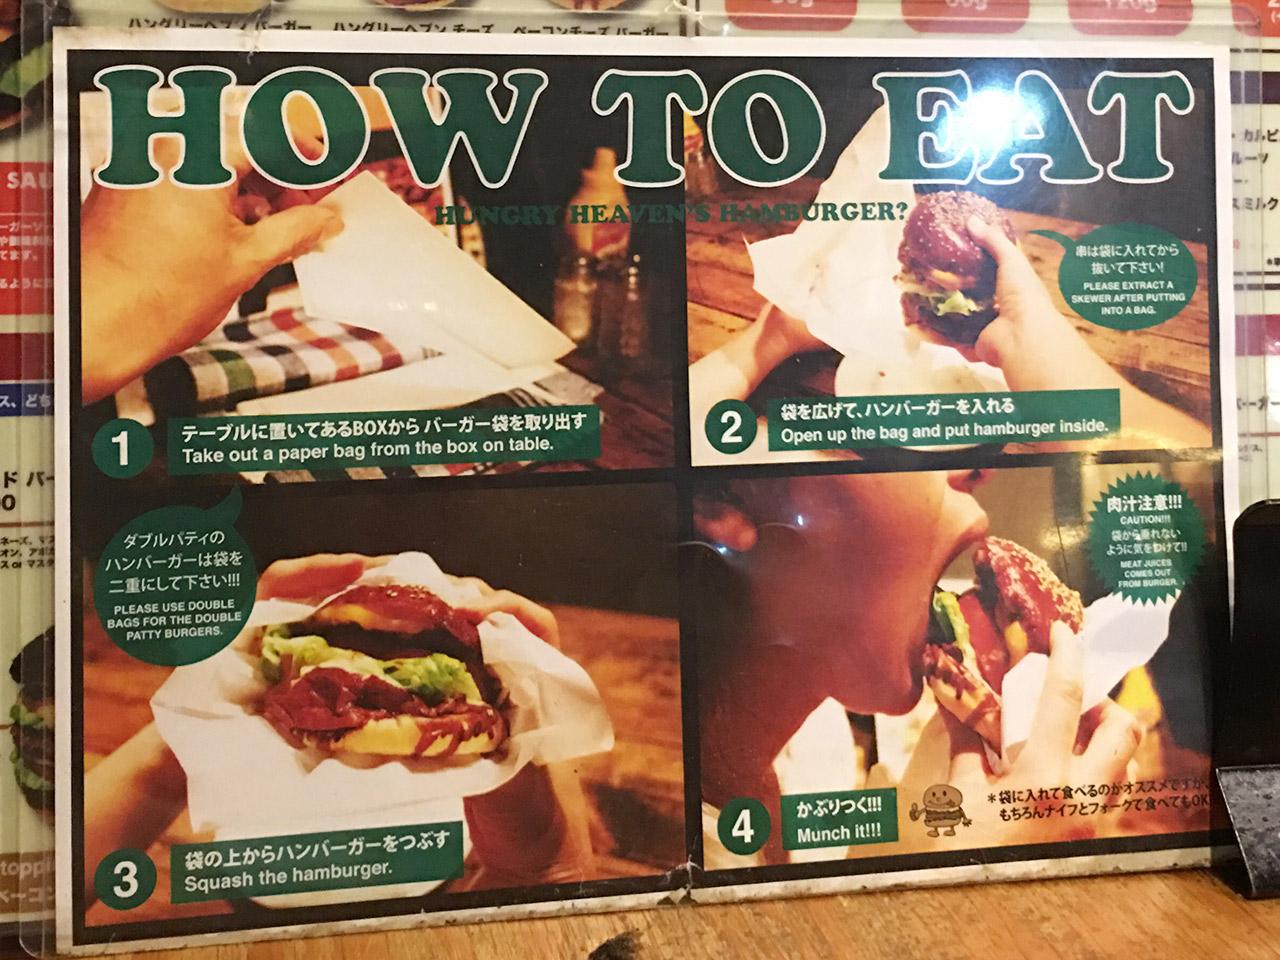 meguro-hungry-heaven-menu05